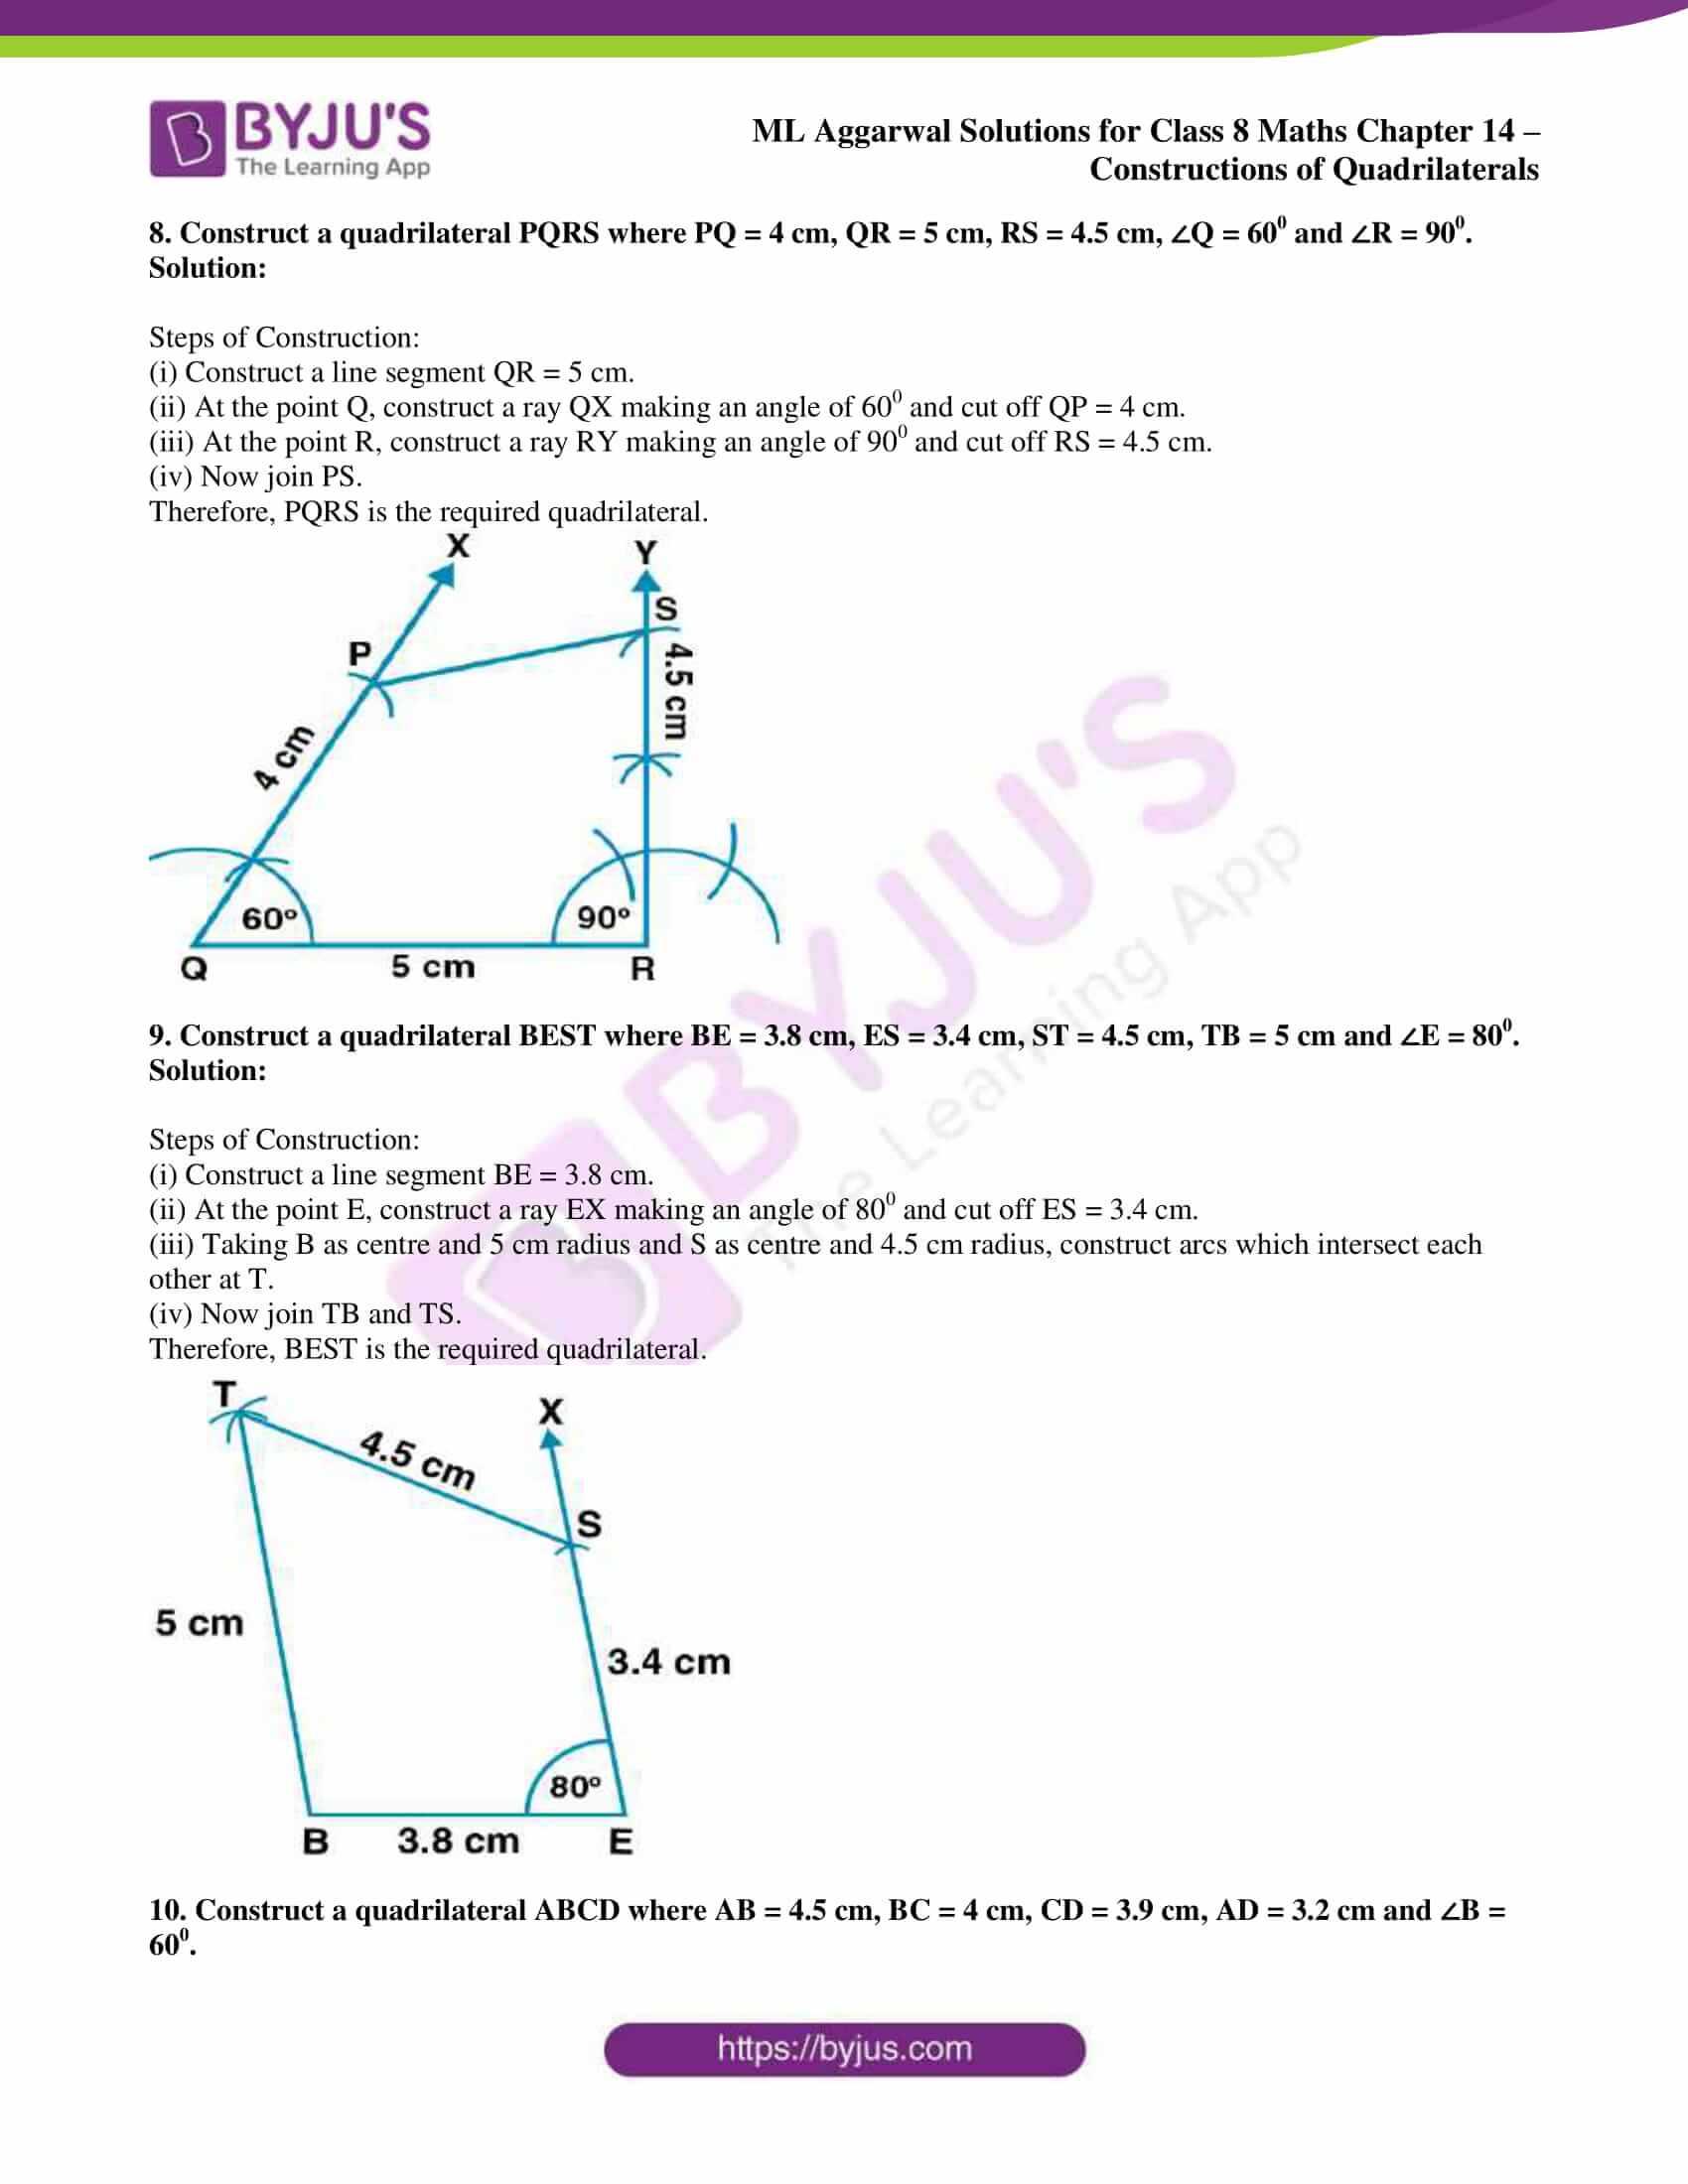 ml aggarwal sol class 7 maths chapter 14 5